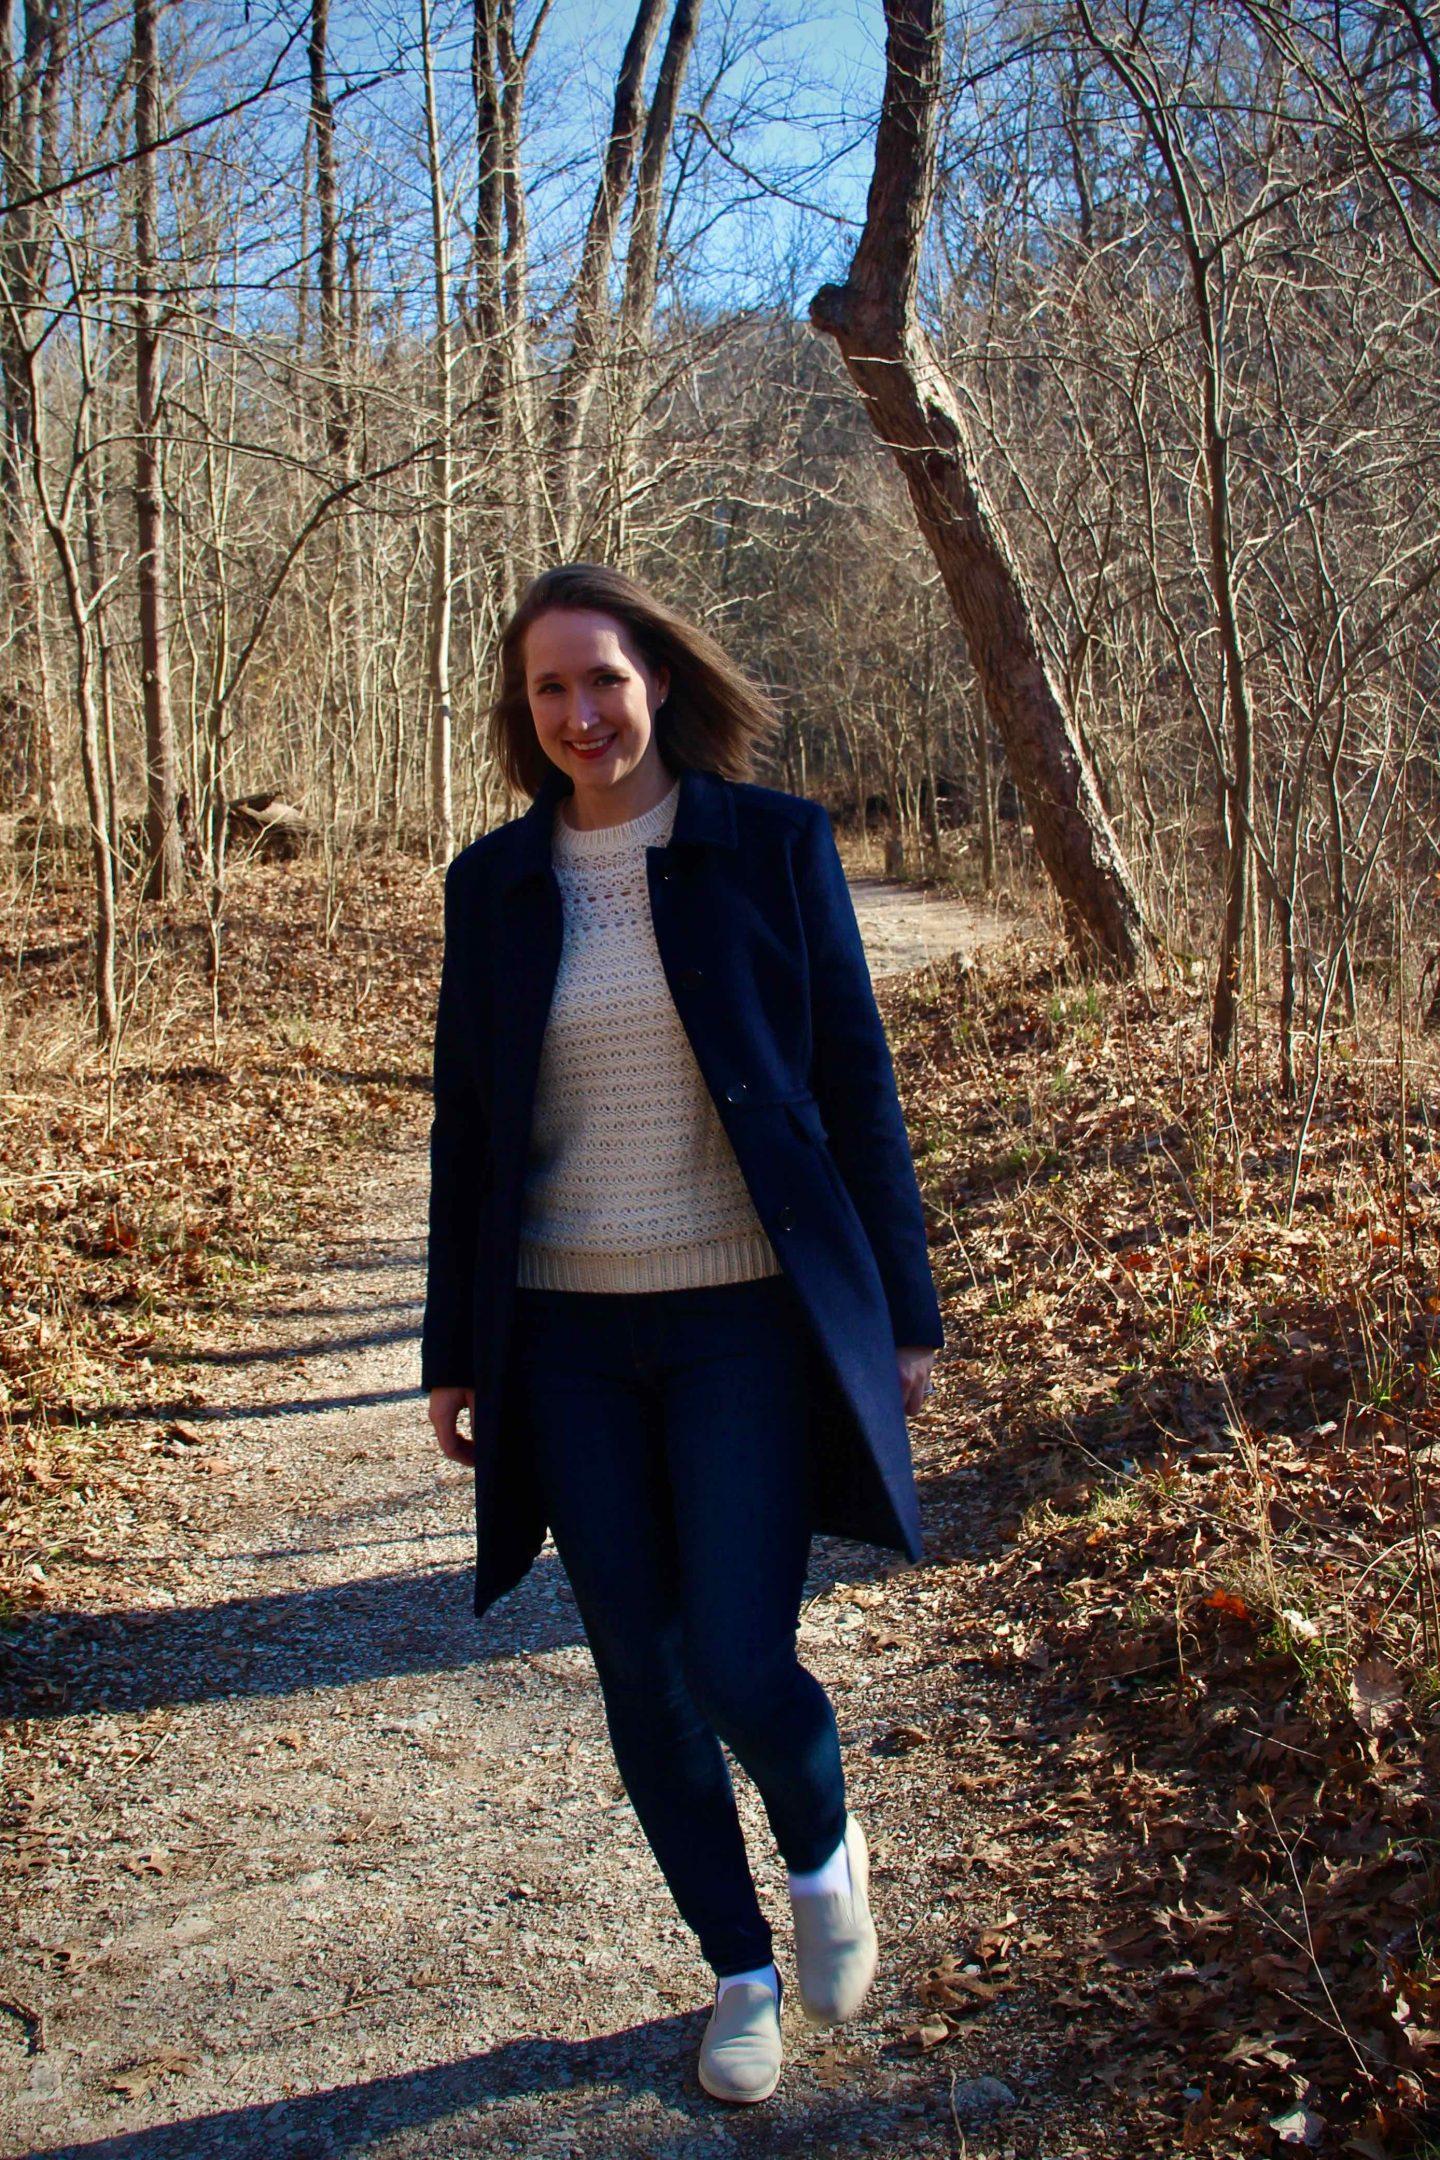 Walks through Sharon Woods | The Spectacular Adventurer